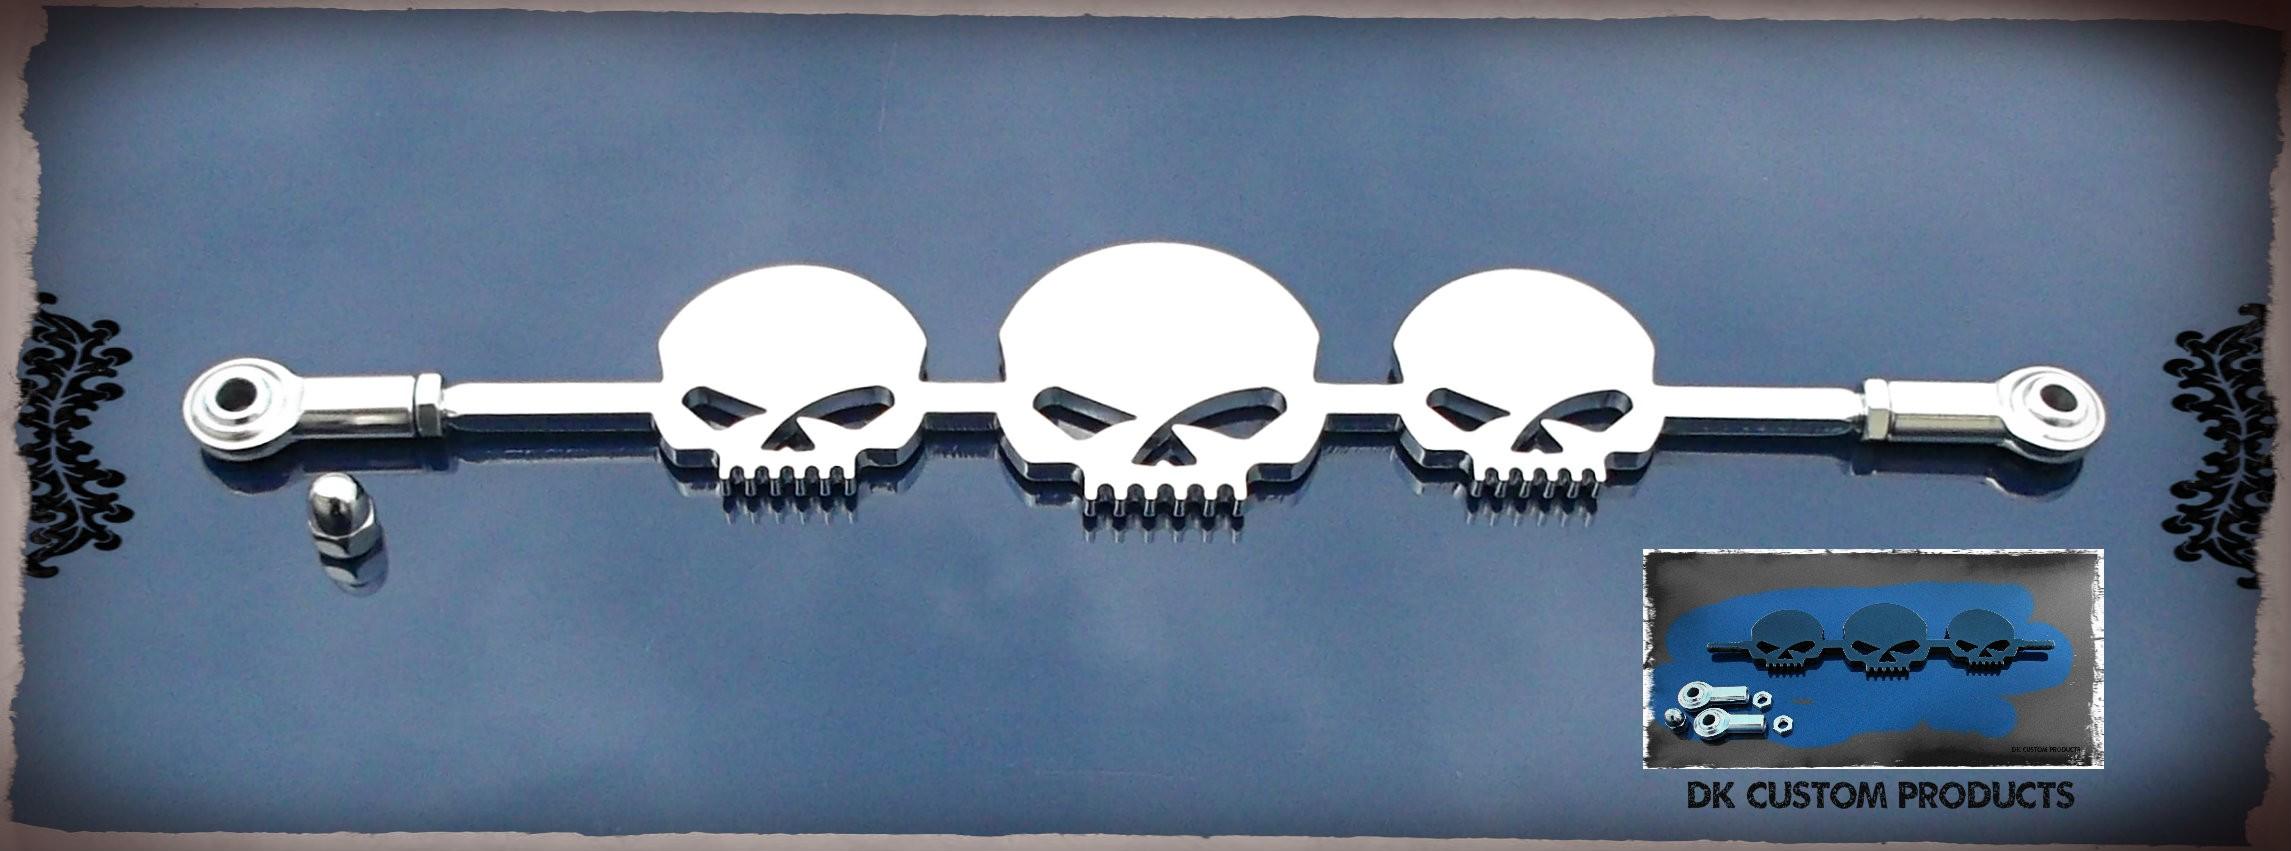 Deep Chrome Skull Shift Linkage  w/ Heim Joints DK Custom Harley davidson Touring Softail Dyna Freewheeler Trike